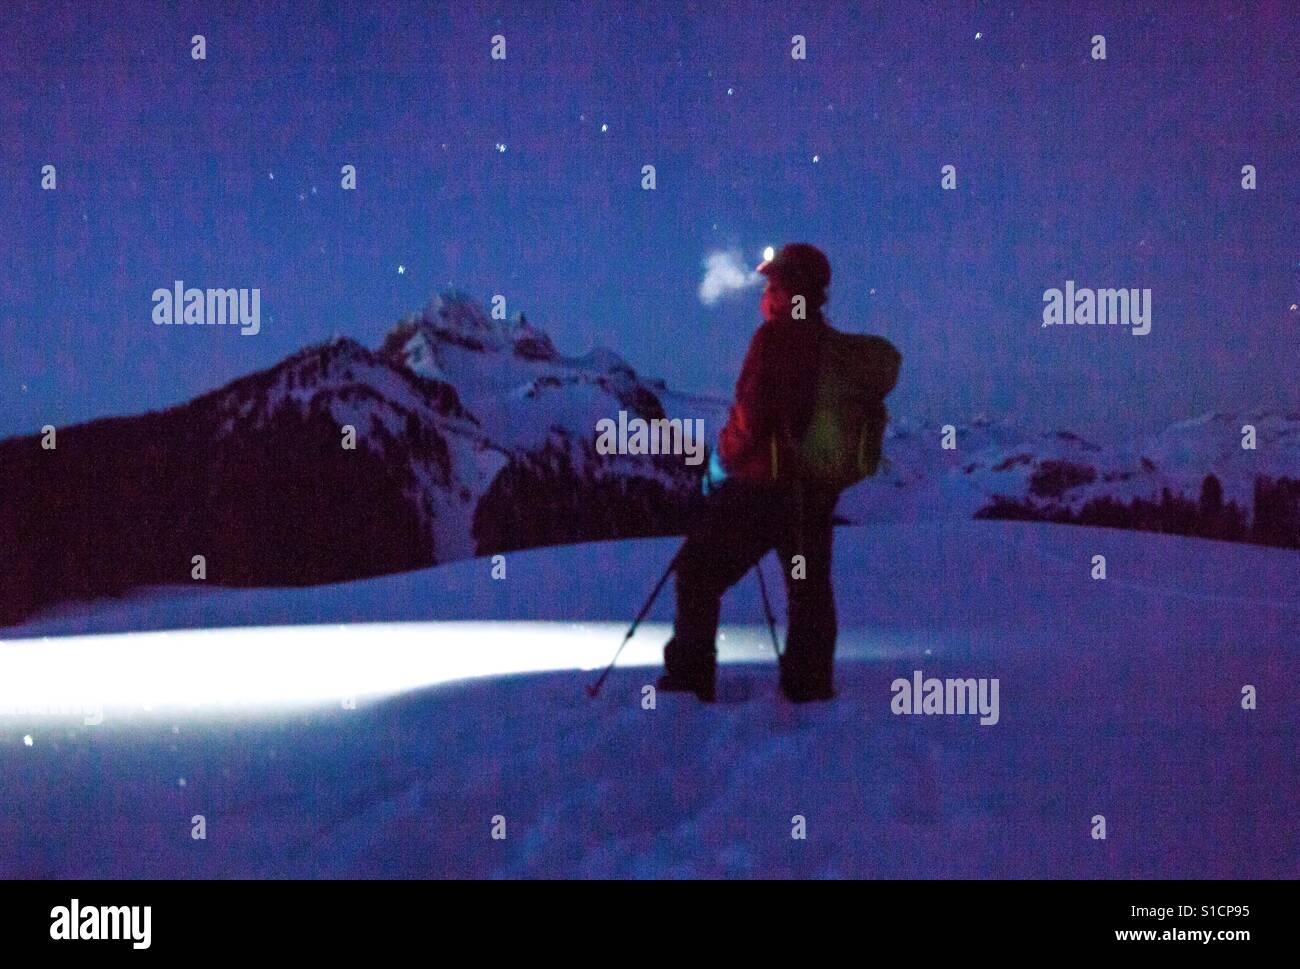 Snowshoeing at night, Elfin Lakes, BC Stock Photo